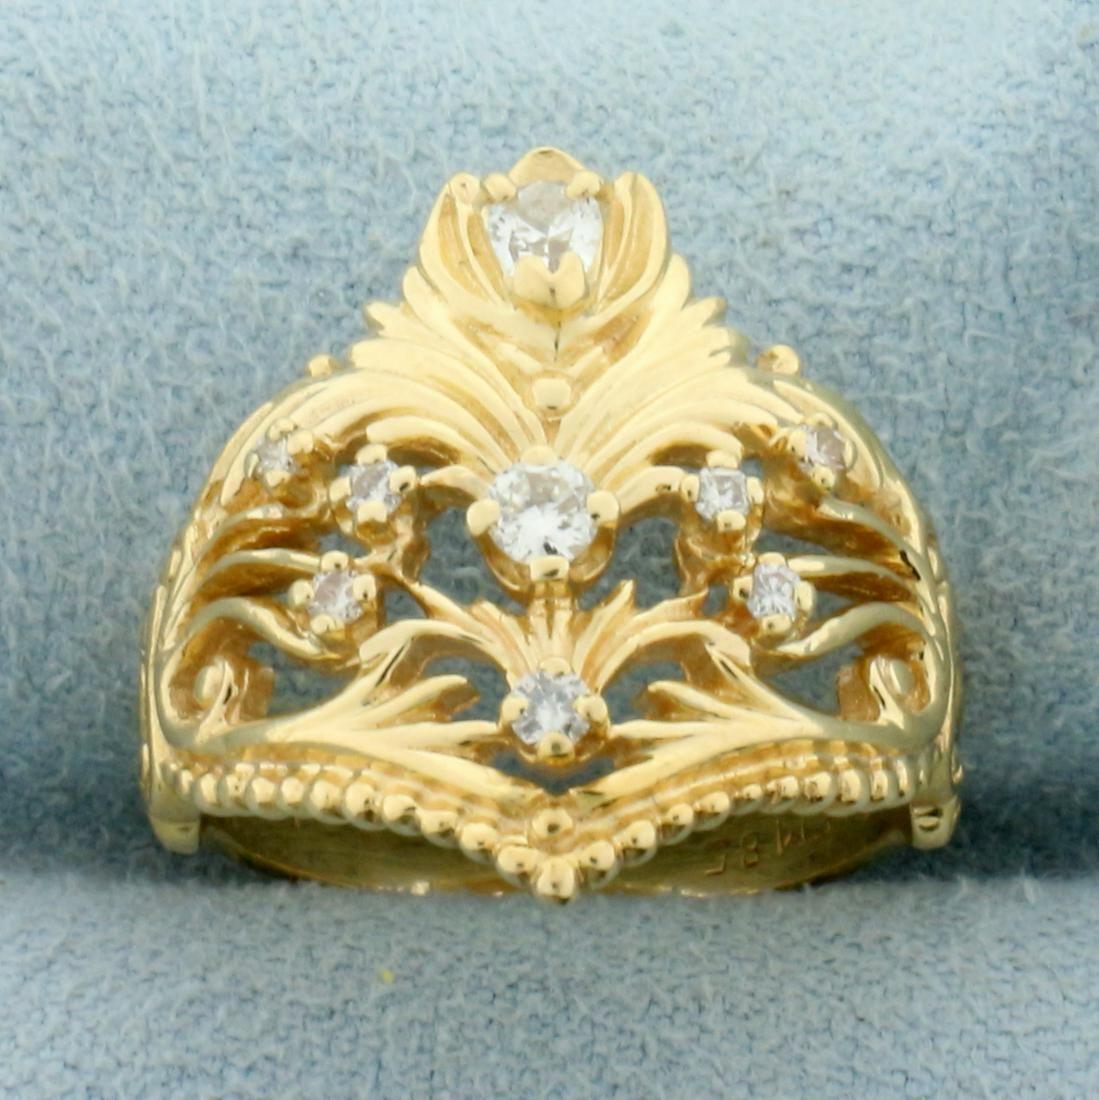 Unique Vintage 1/3ct TW Diamond Ring in 14K Yellow Gold